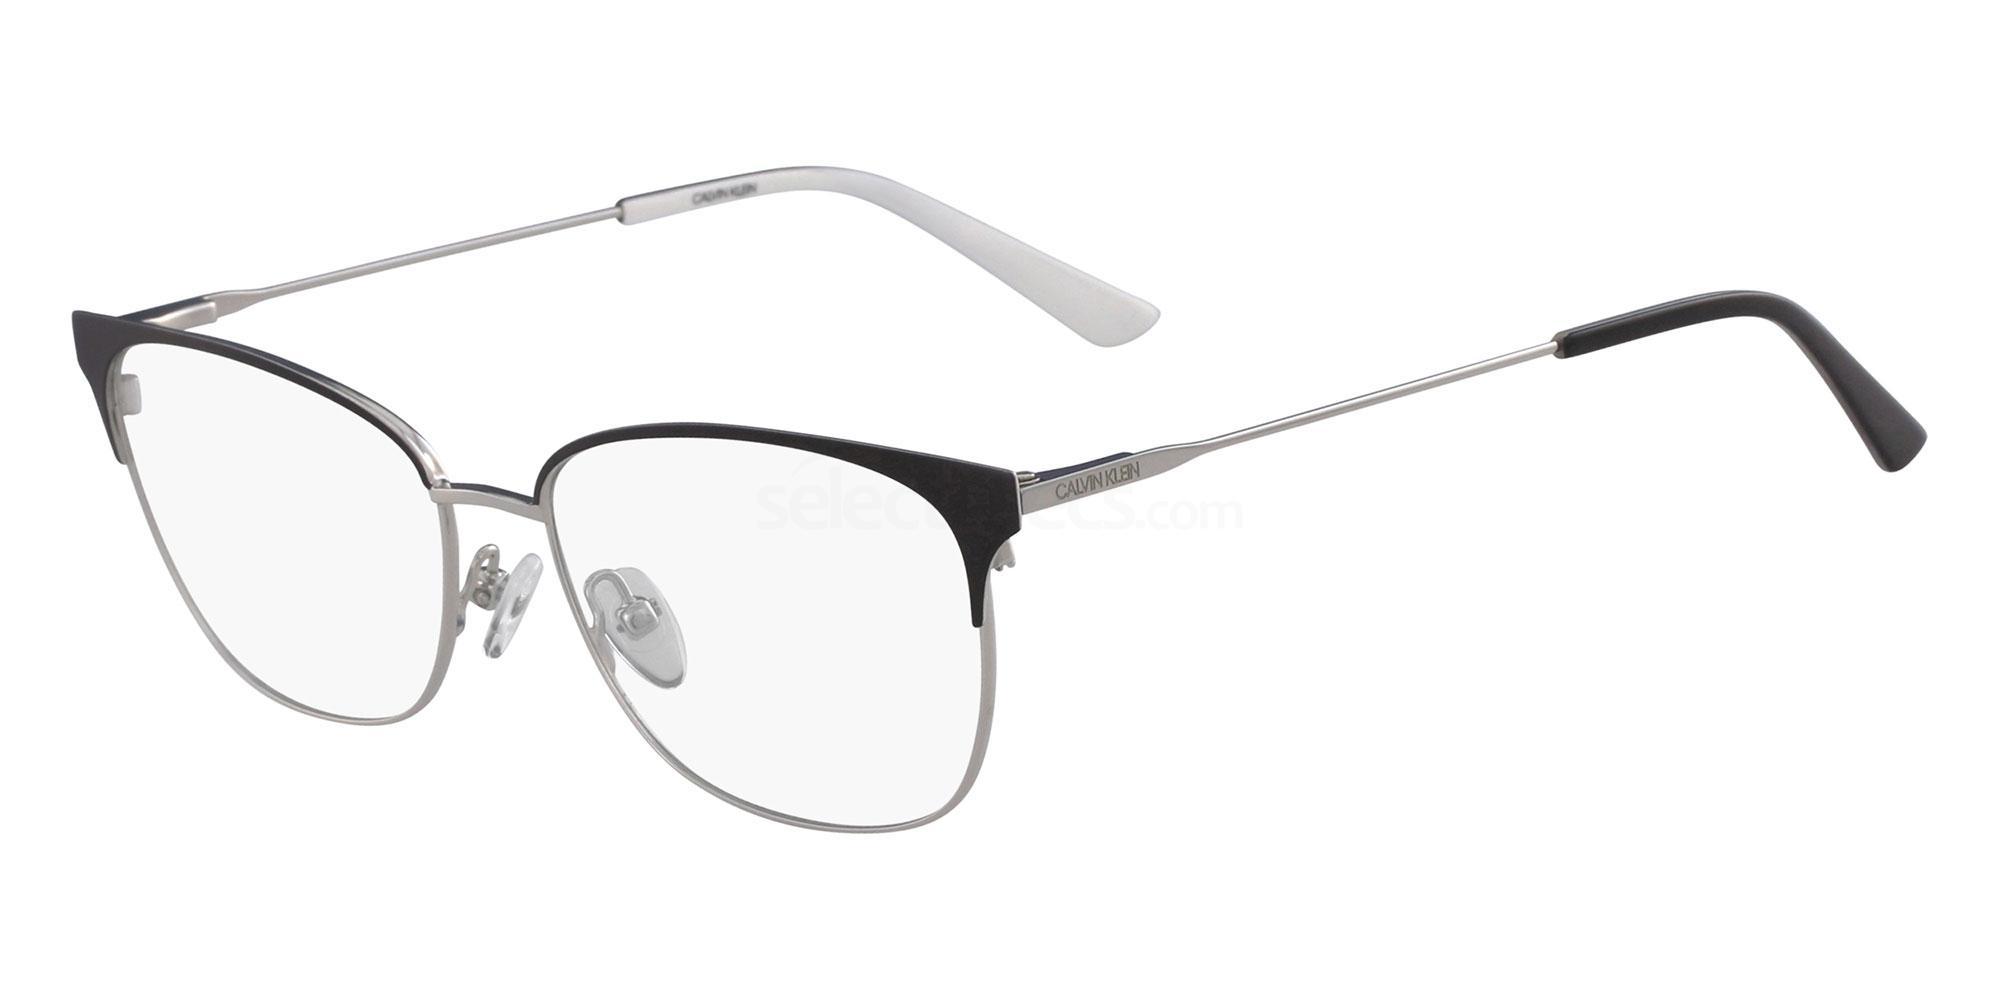 001 CK18108 Glasses, Calvin Klein